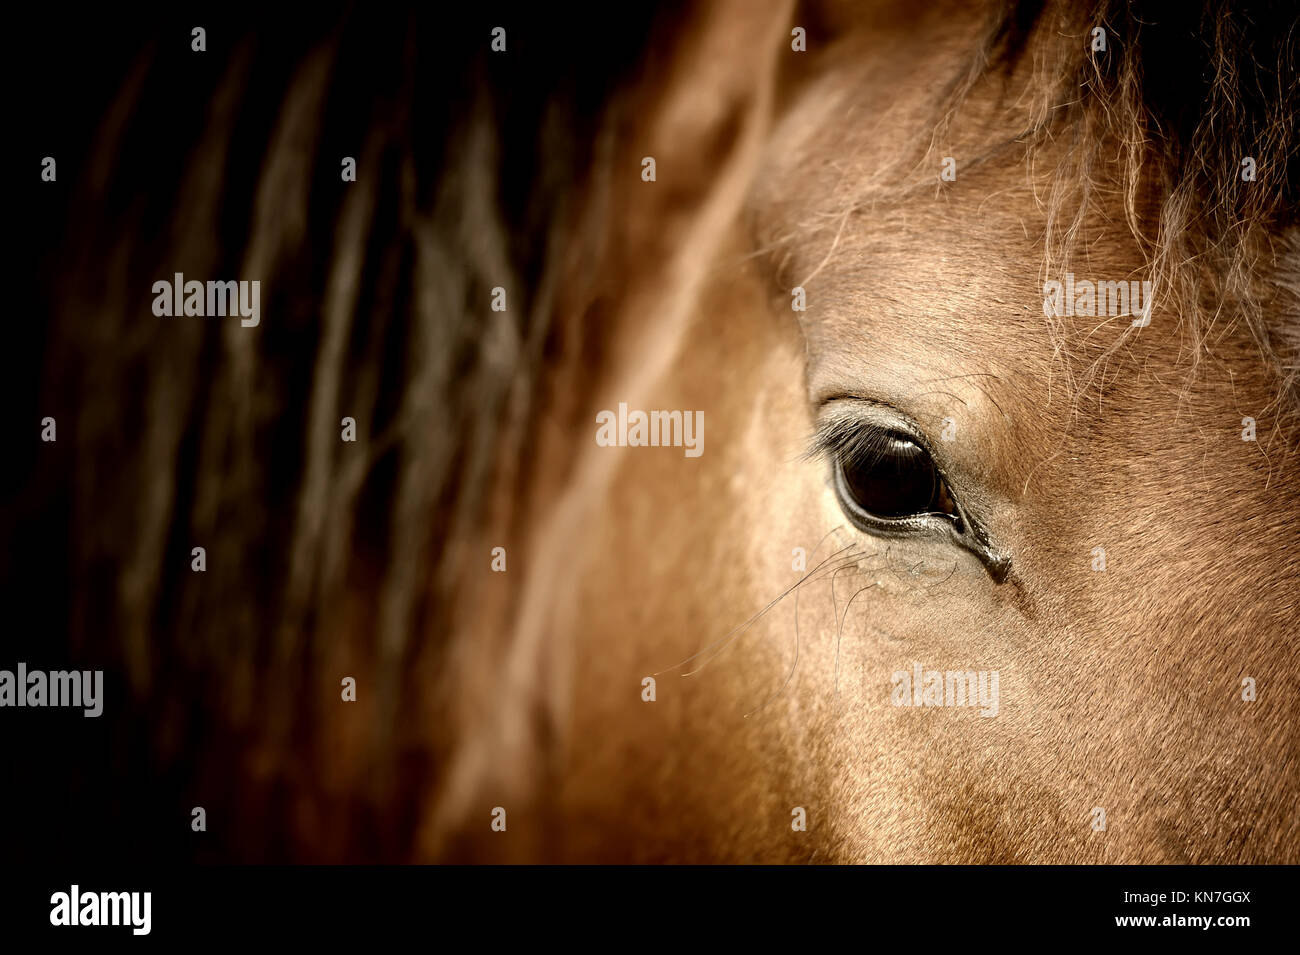 Close-up eye of Arabian bay horse - Stock Image